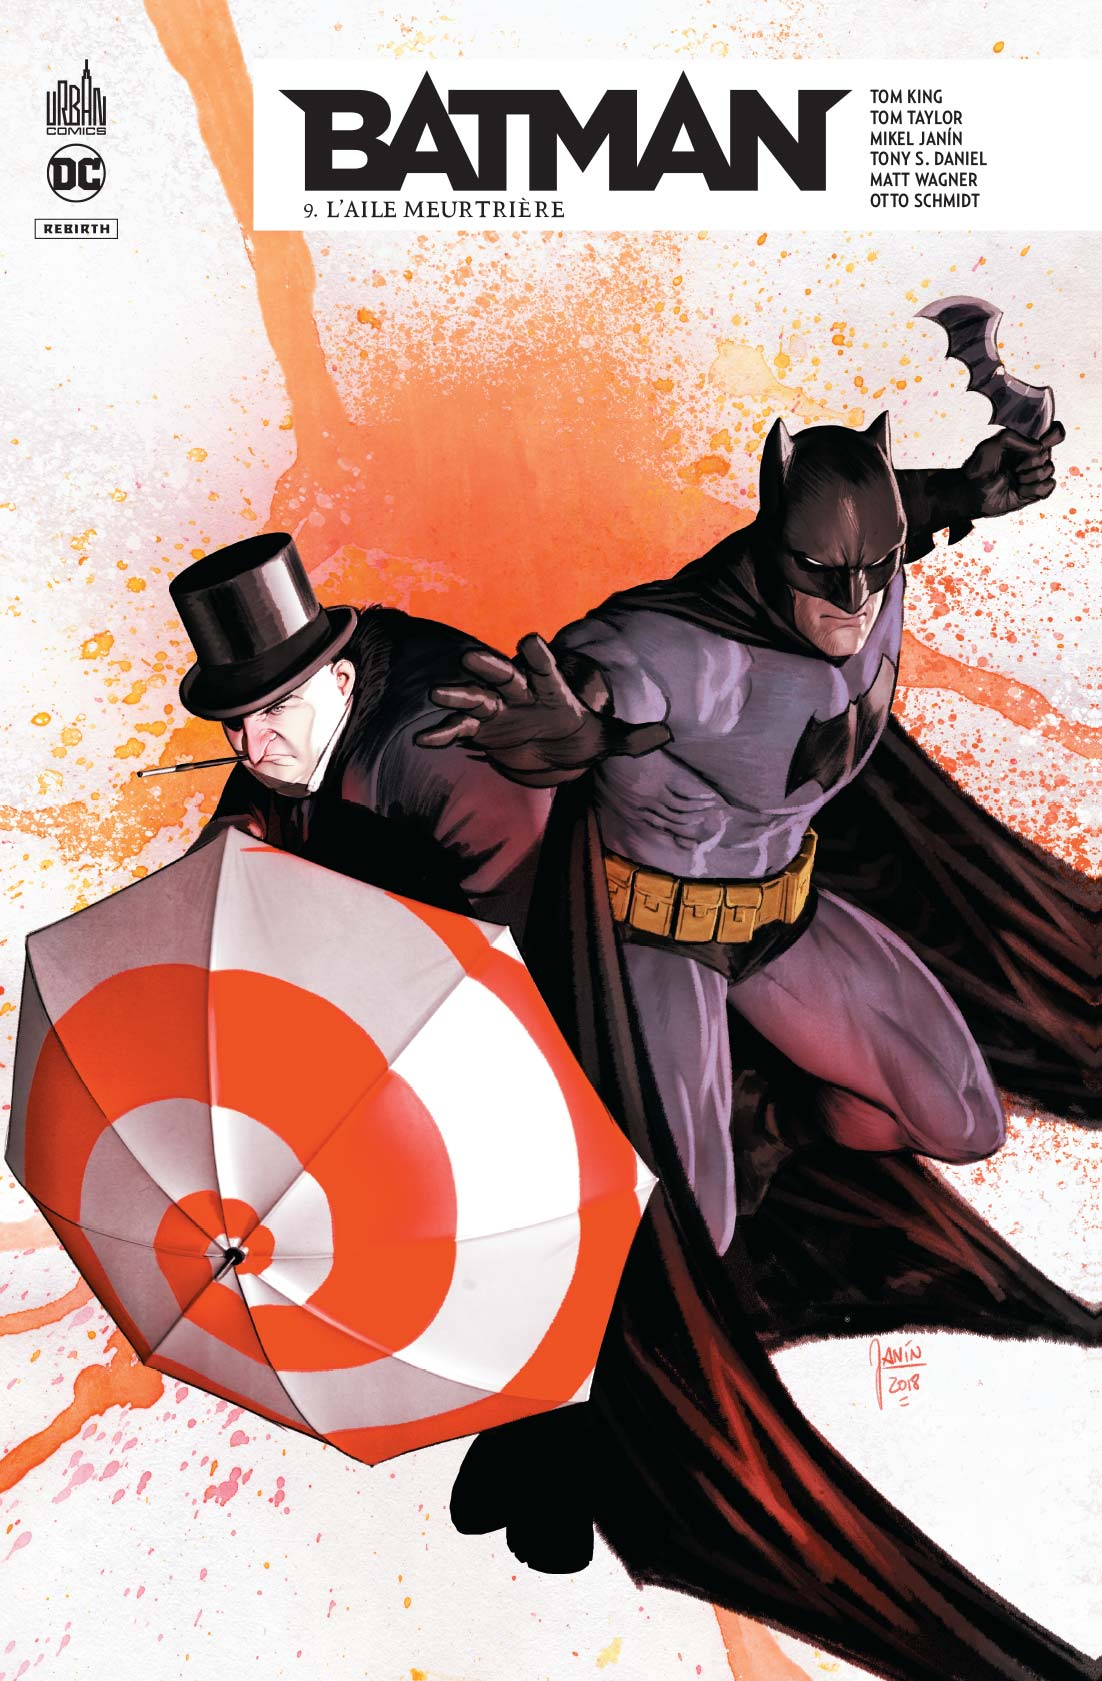 Batman Rebirth 9 - Batman rebirth tome 9